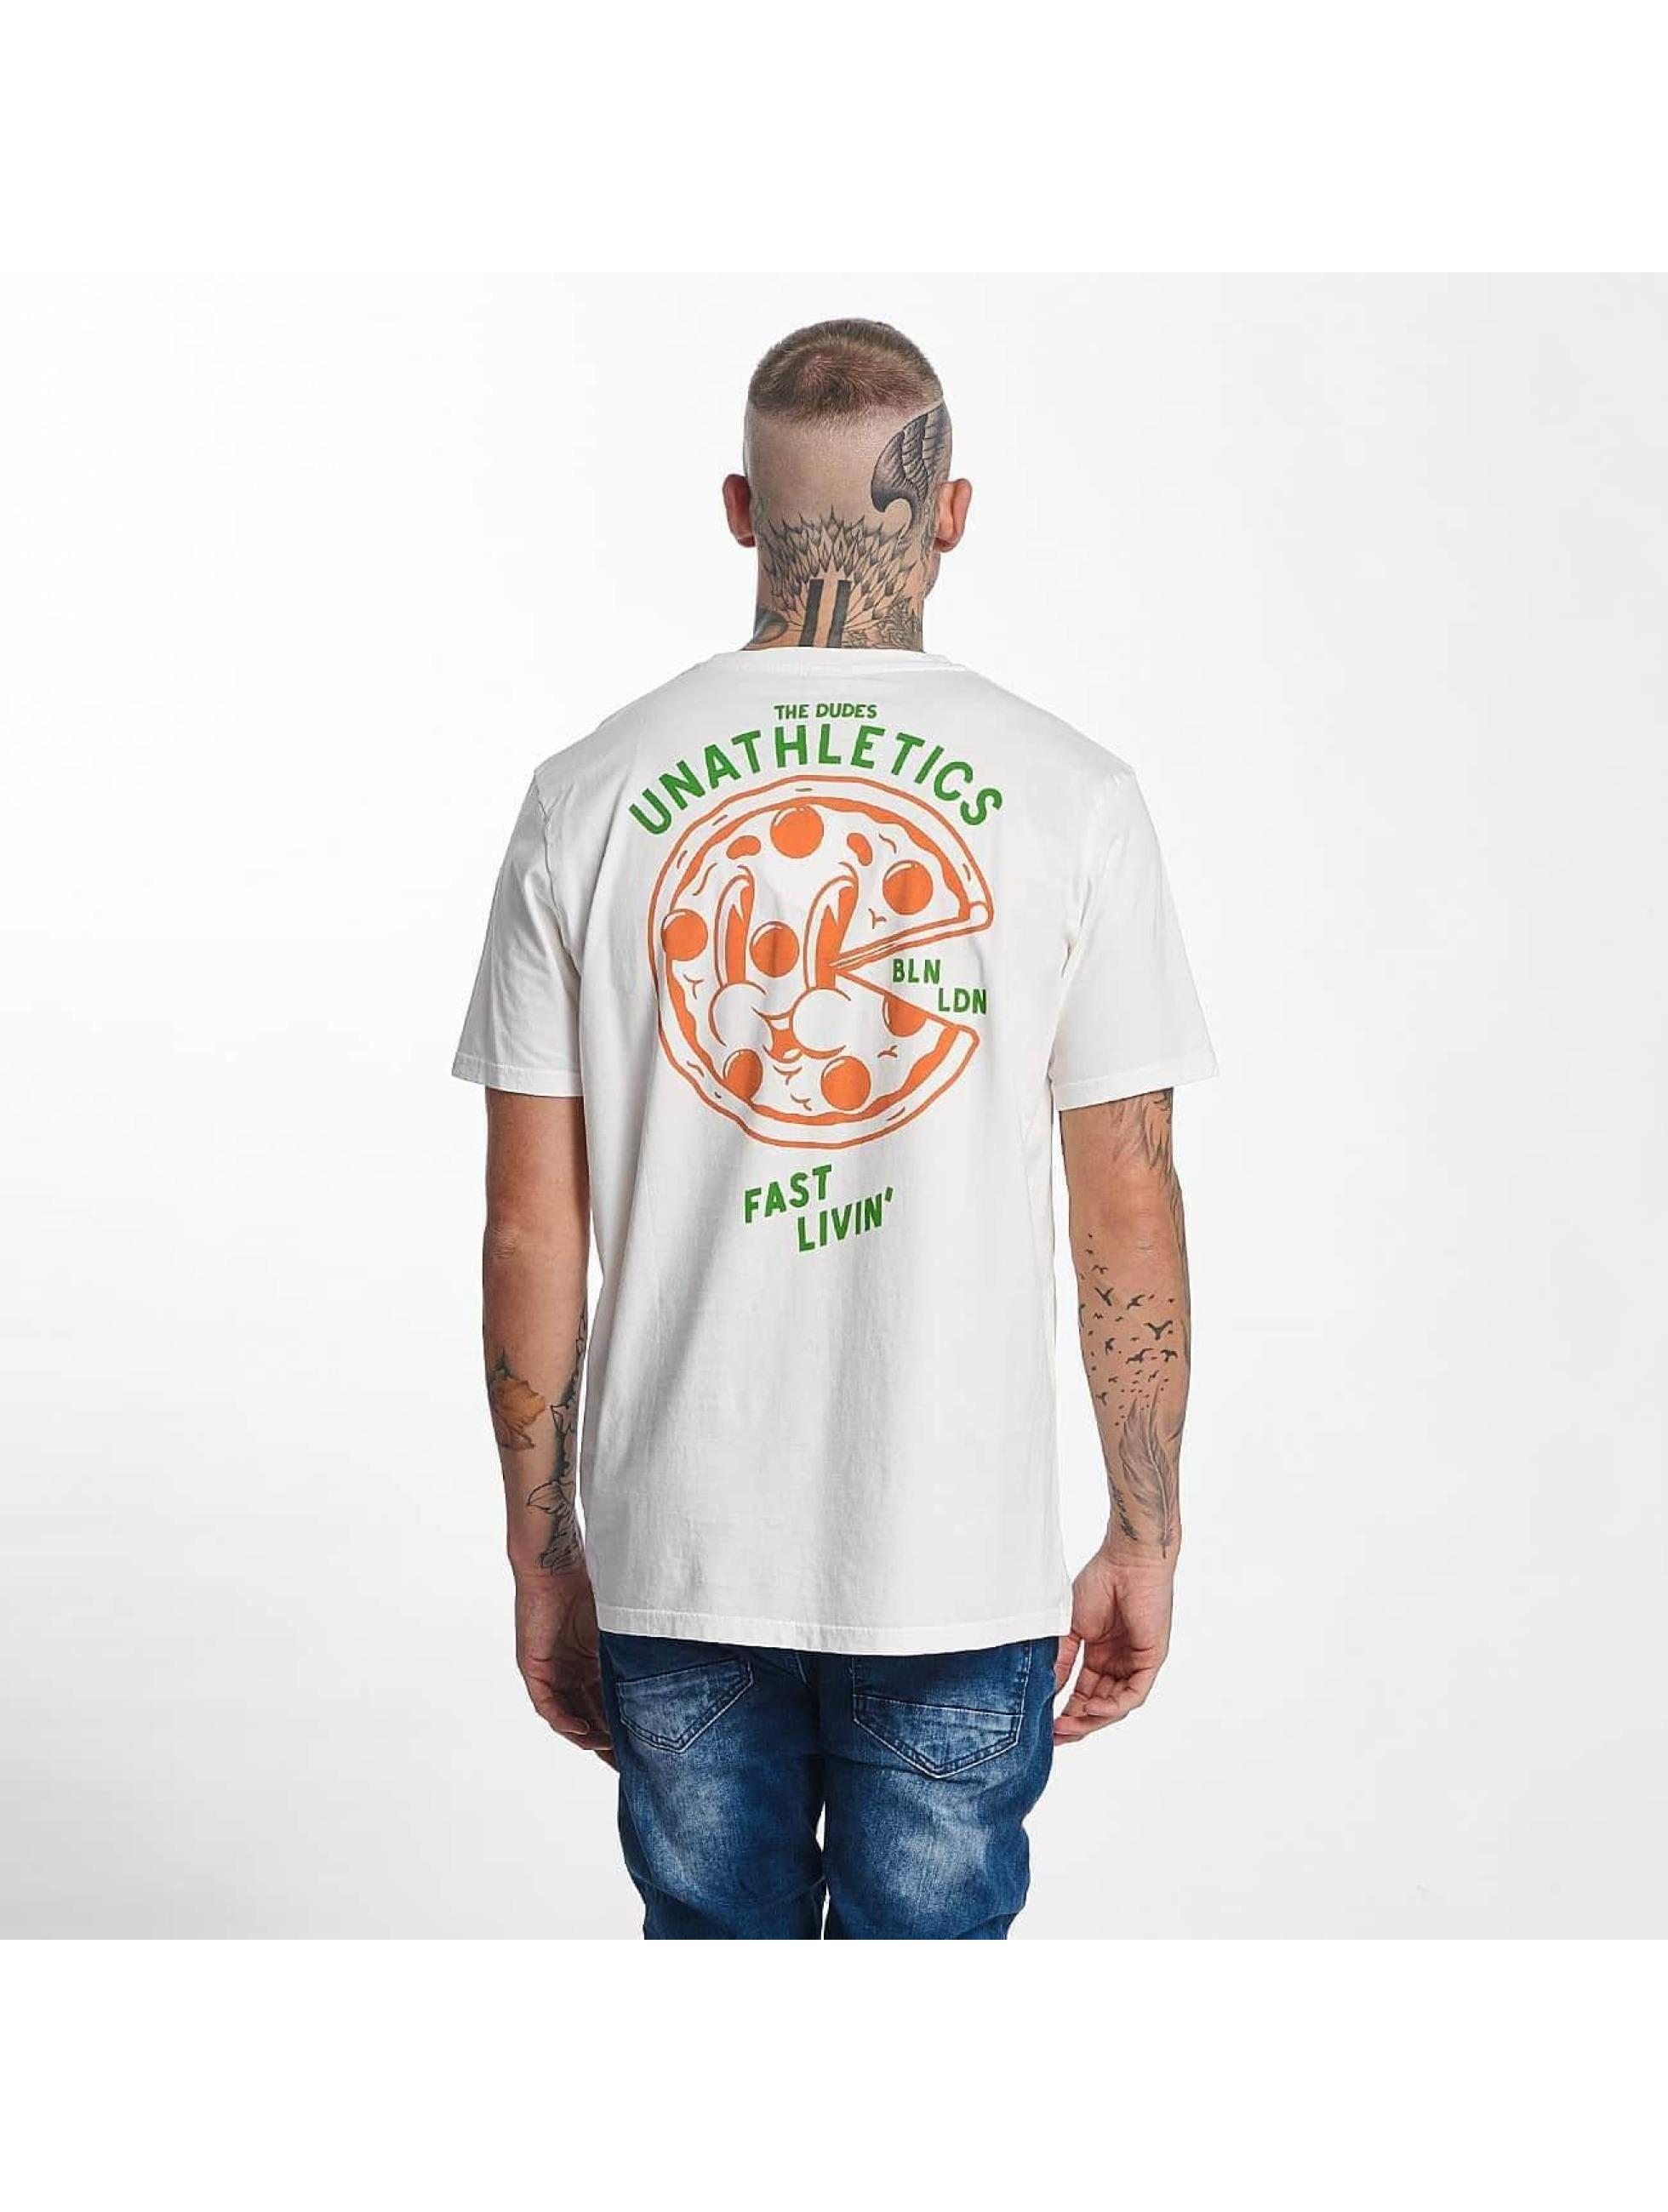 The Dudes Männer T-Shirt Pizza 24/7 in weiß